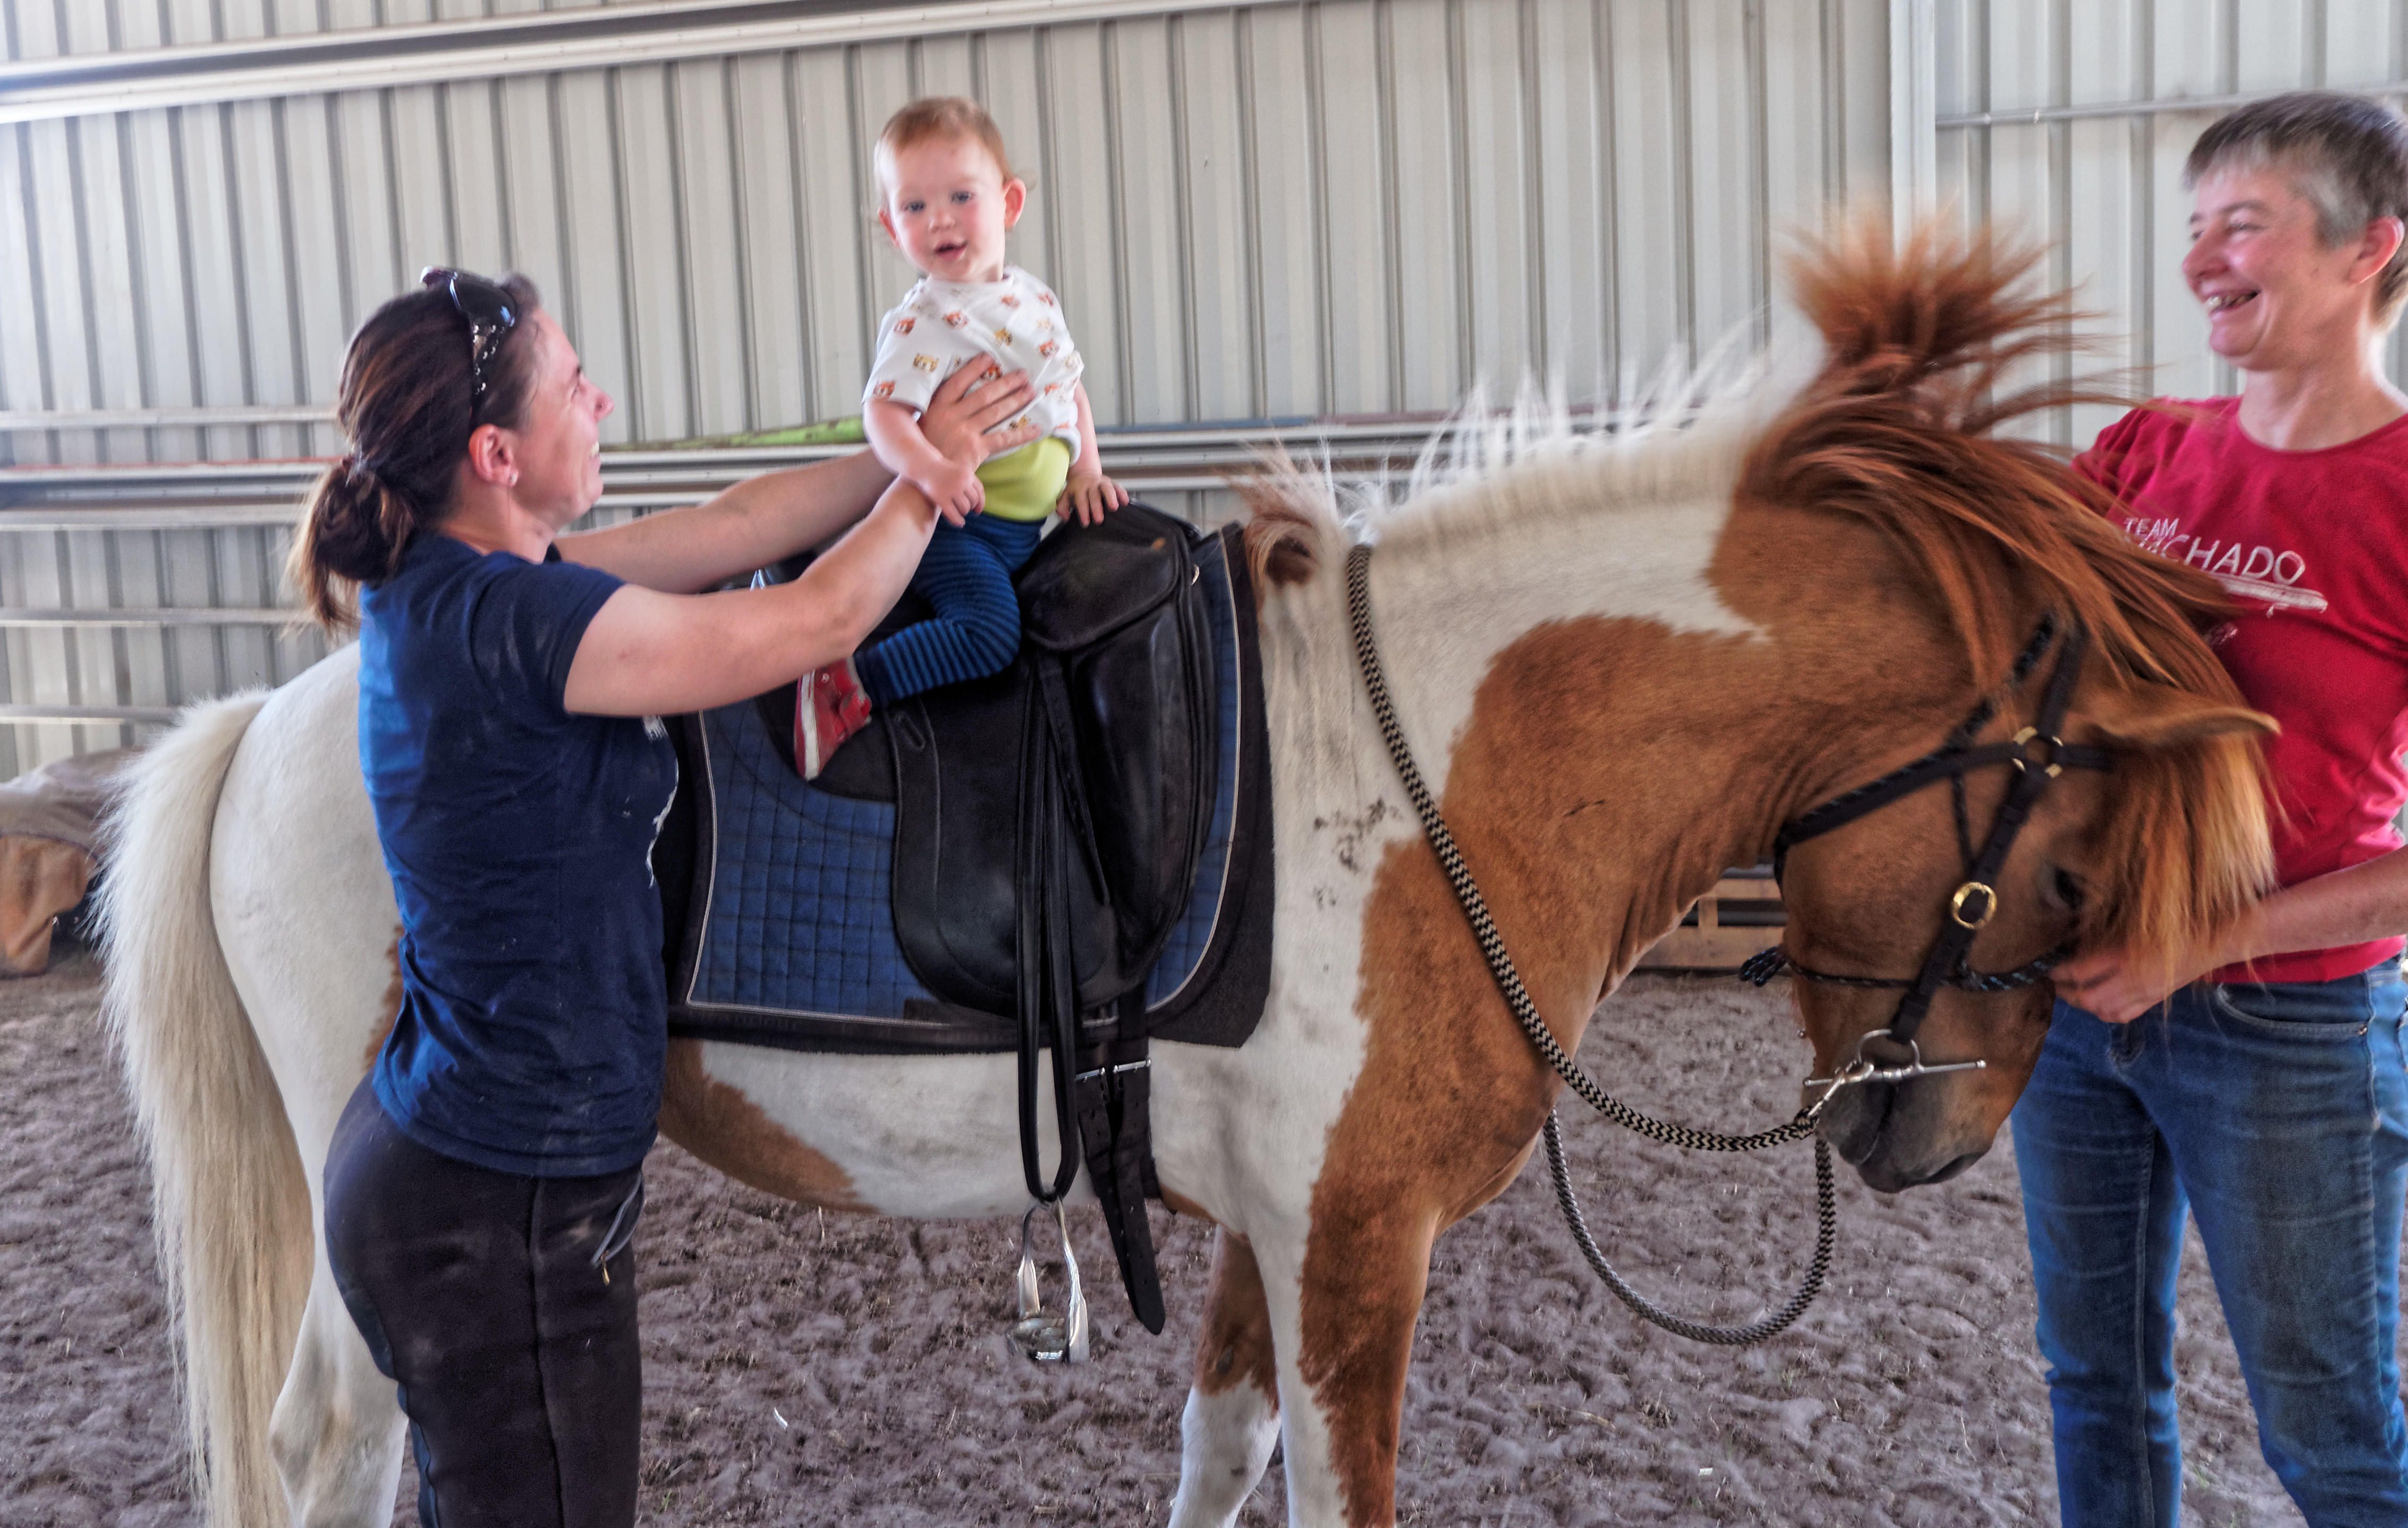 pony-ride-4.jpeg